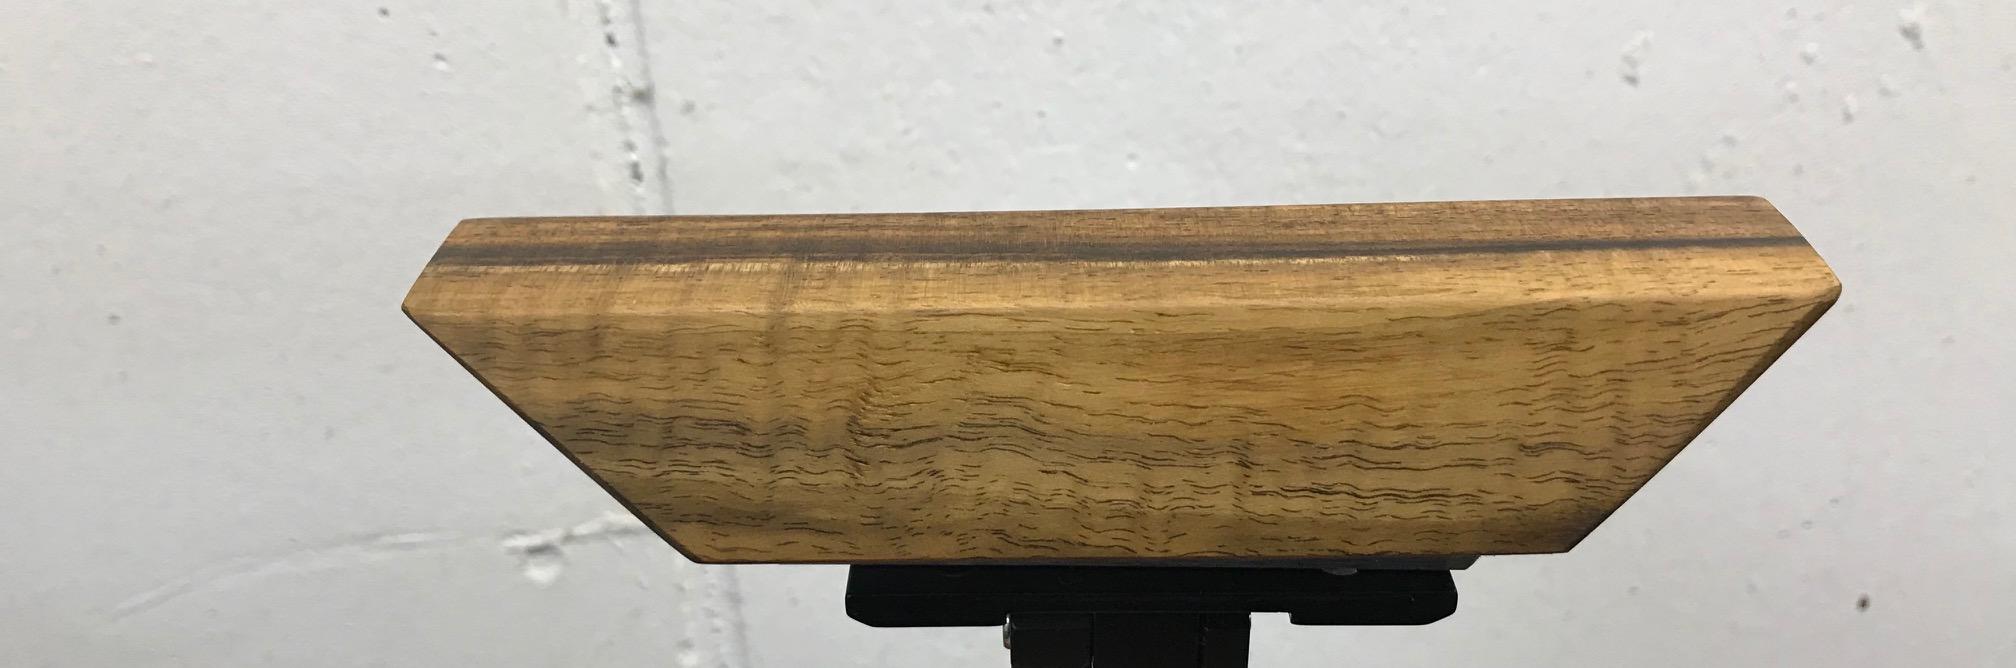 neue Schaftbacke fürs FWB 800 W